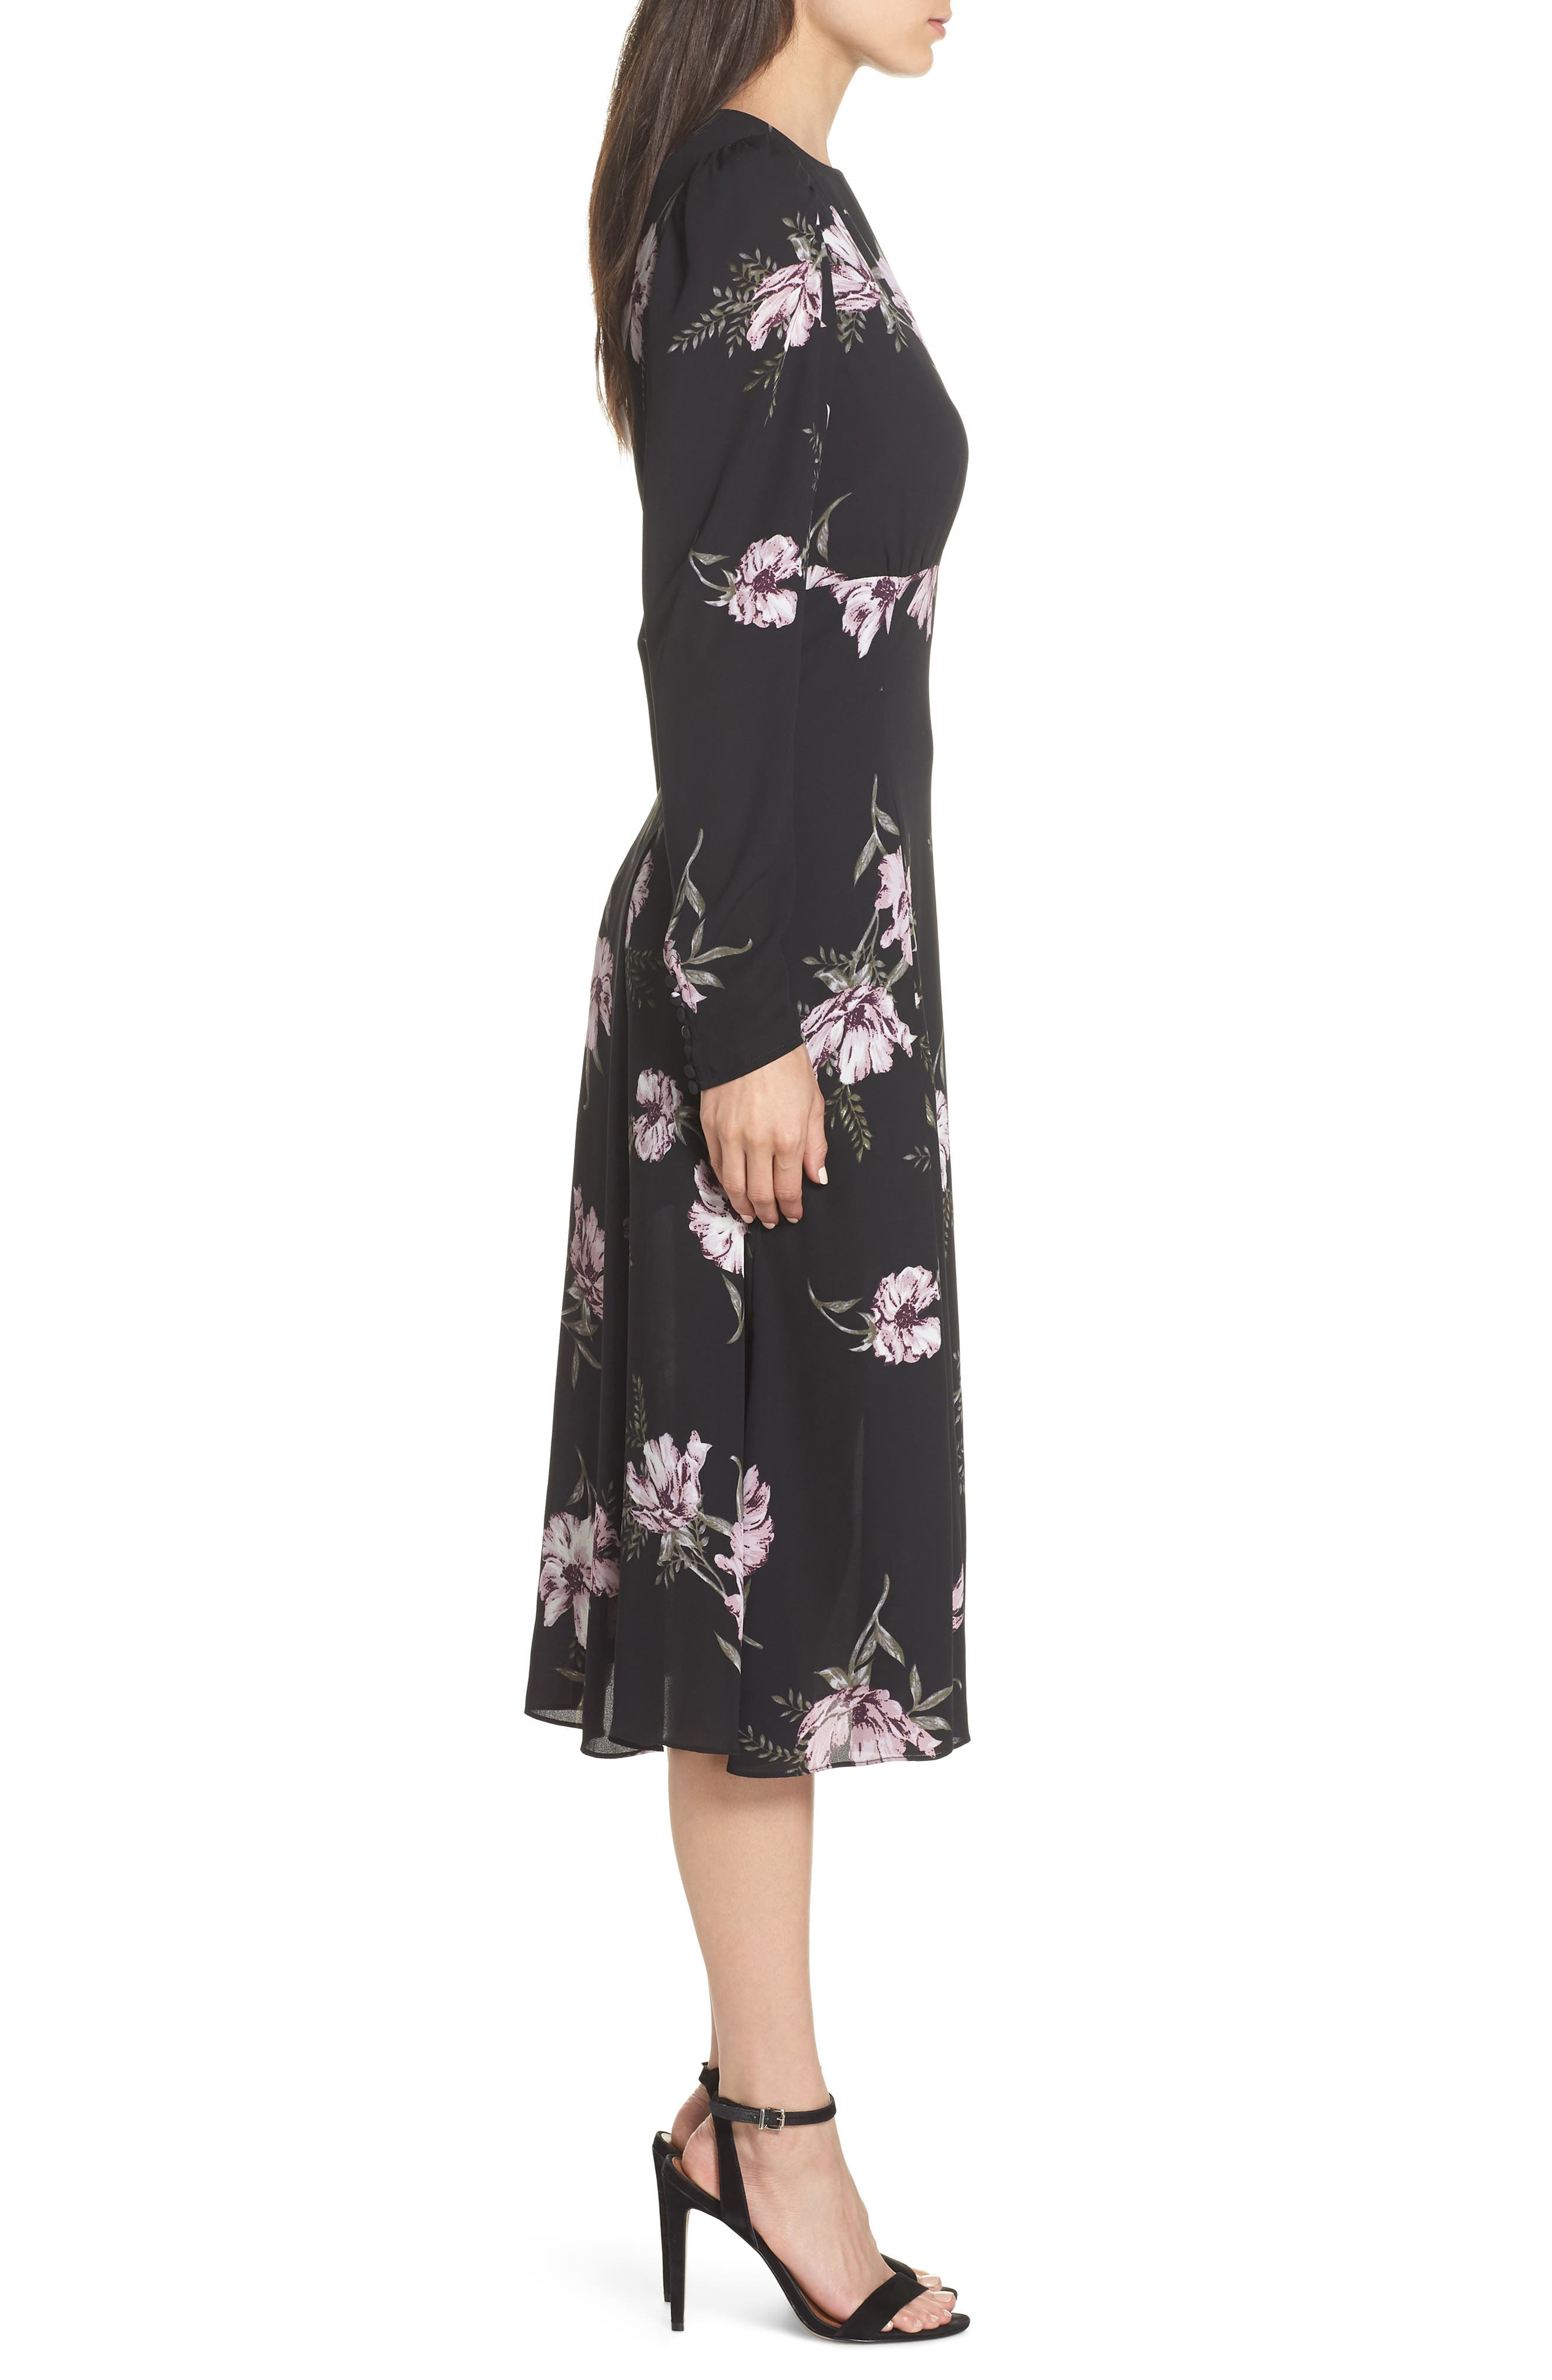 Floral Print Midi Dress,                             Alternate thumbnail 3, color,                             BLACK BLOOMING PEONY